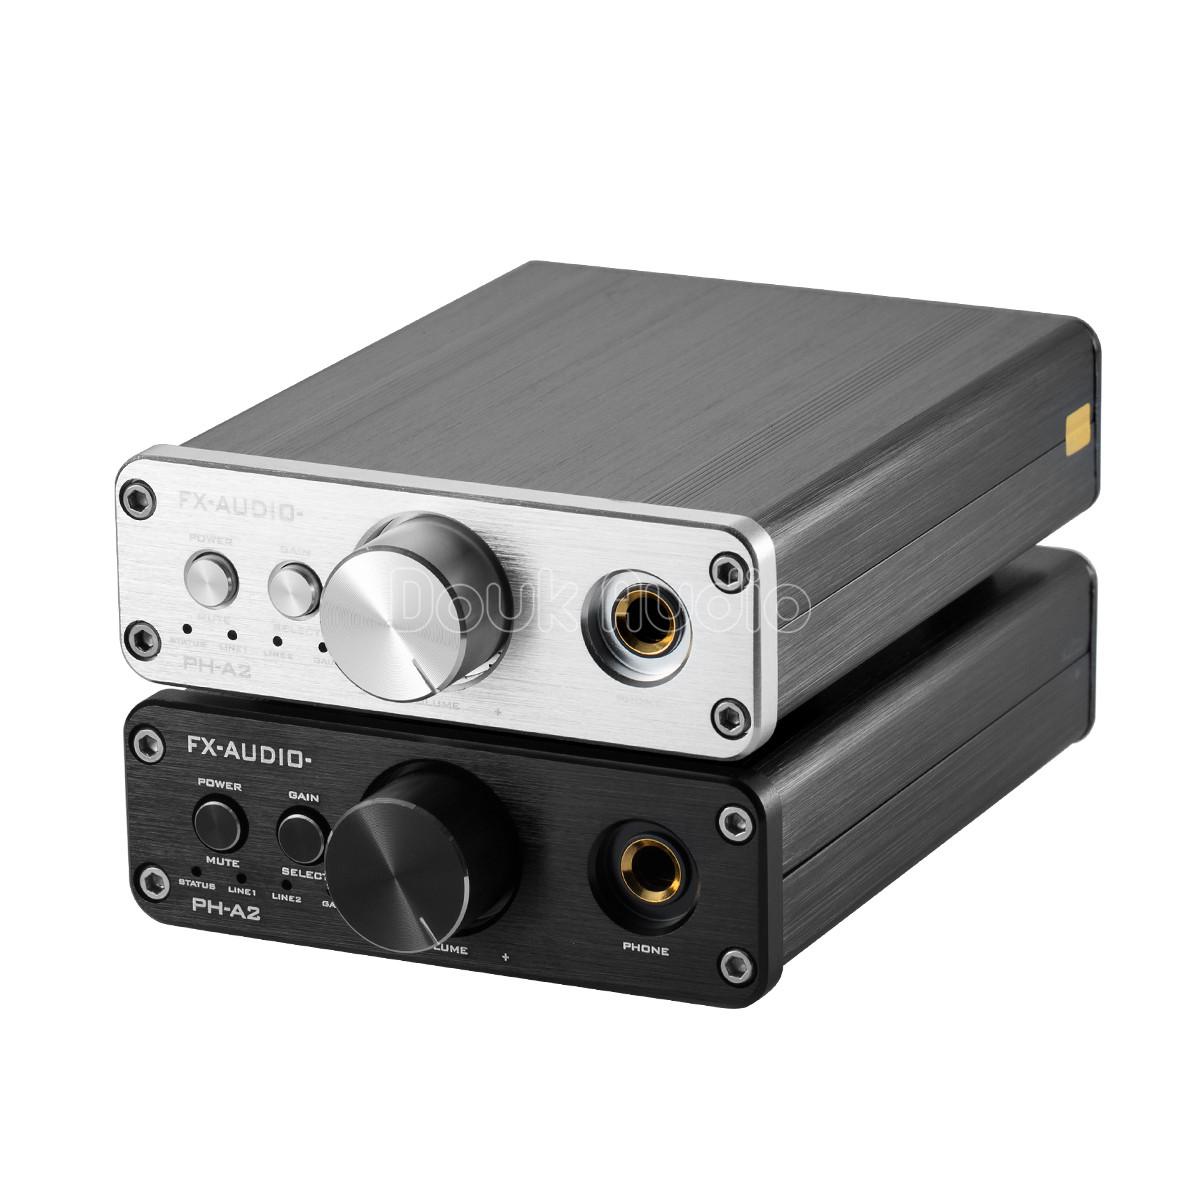 Tpa6120 Hifi Portable Headphone Amplifier Mini Stereo